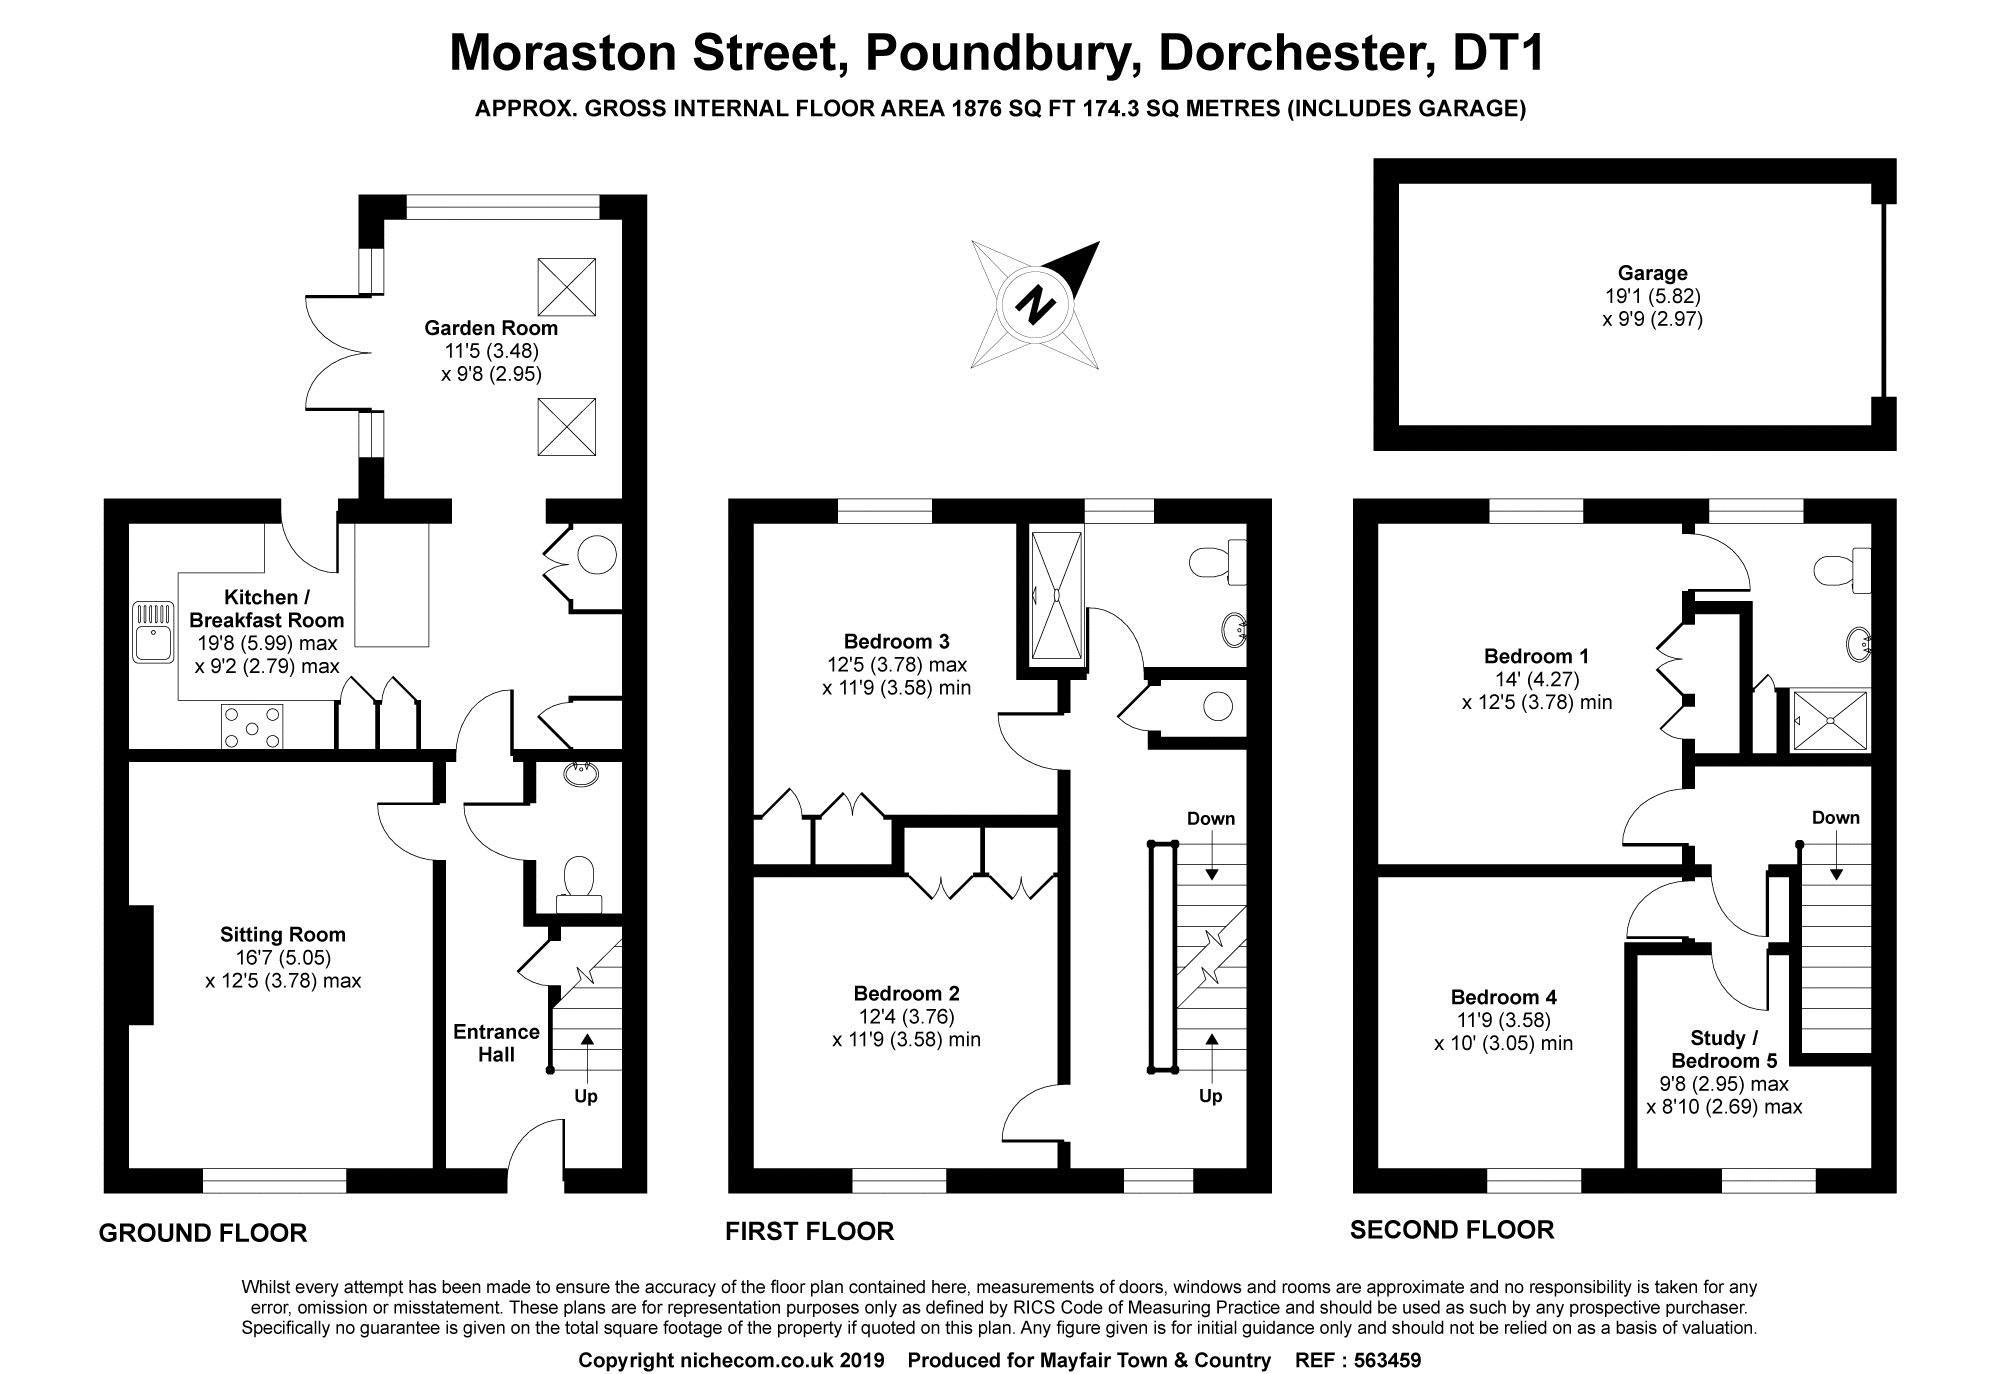 Moraston Street Poundbury